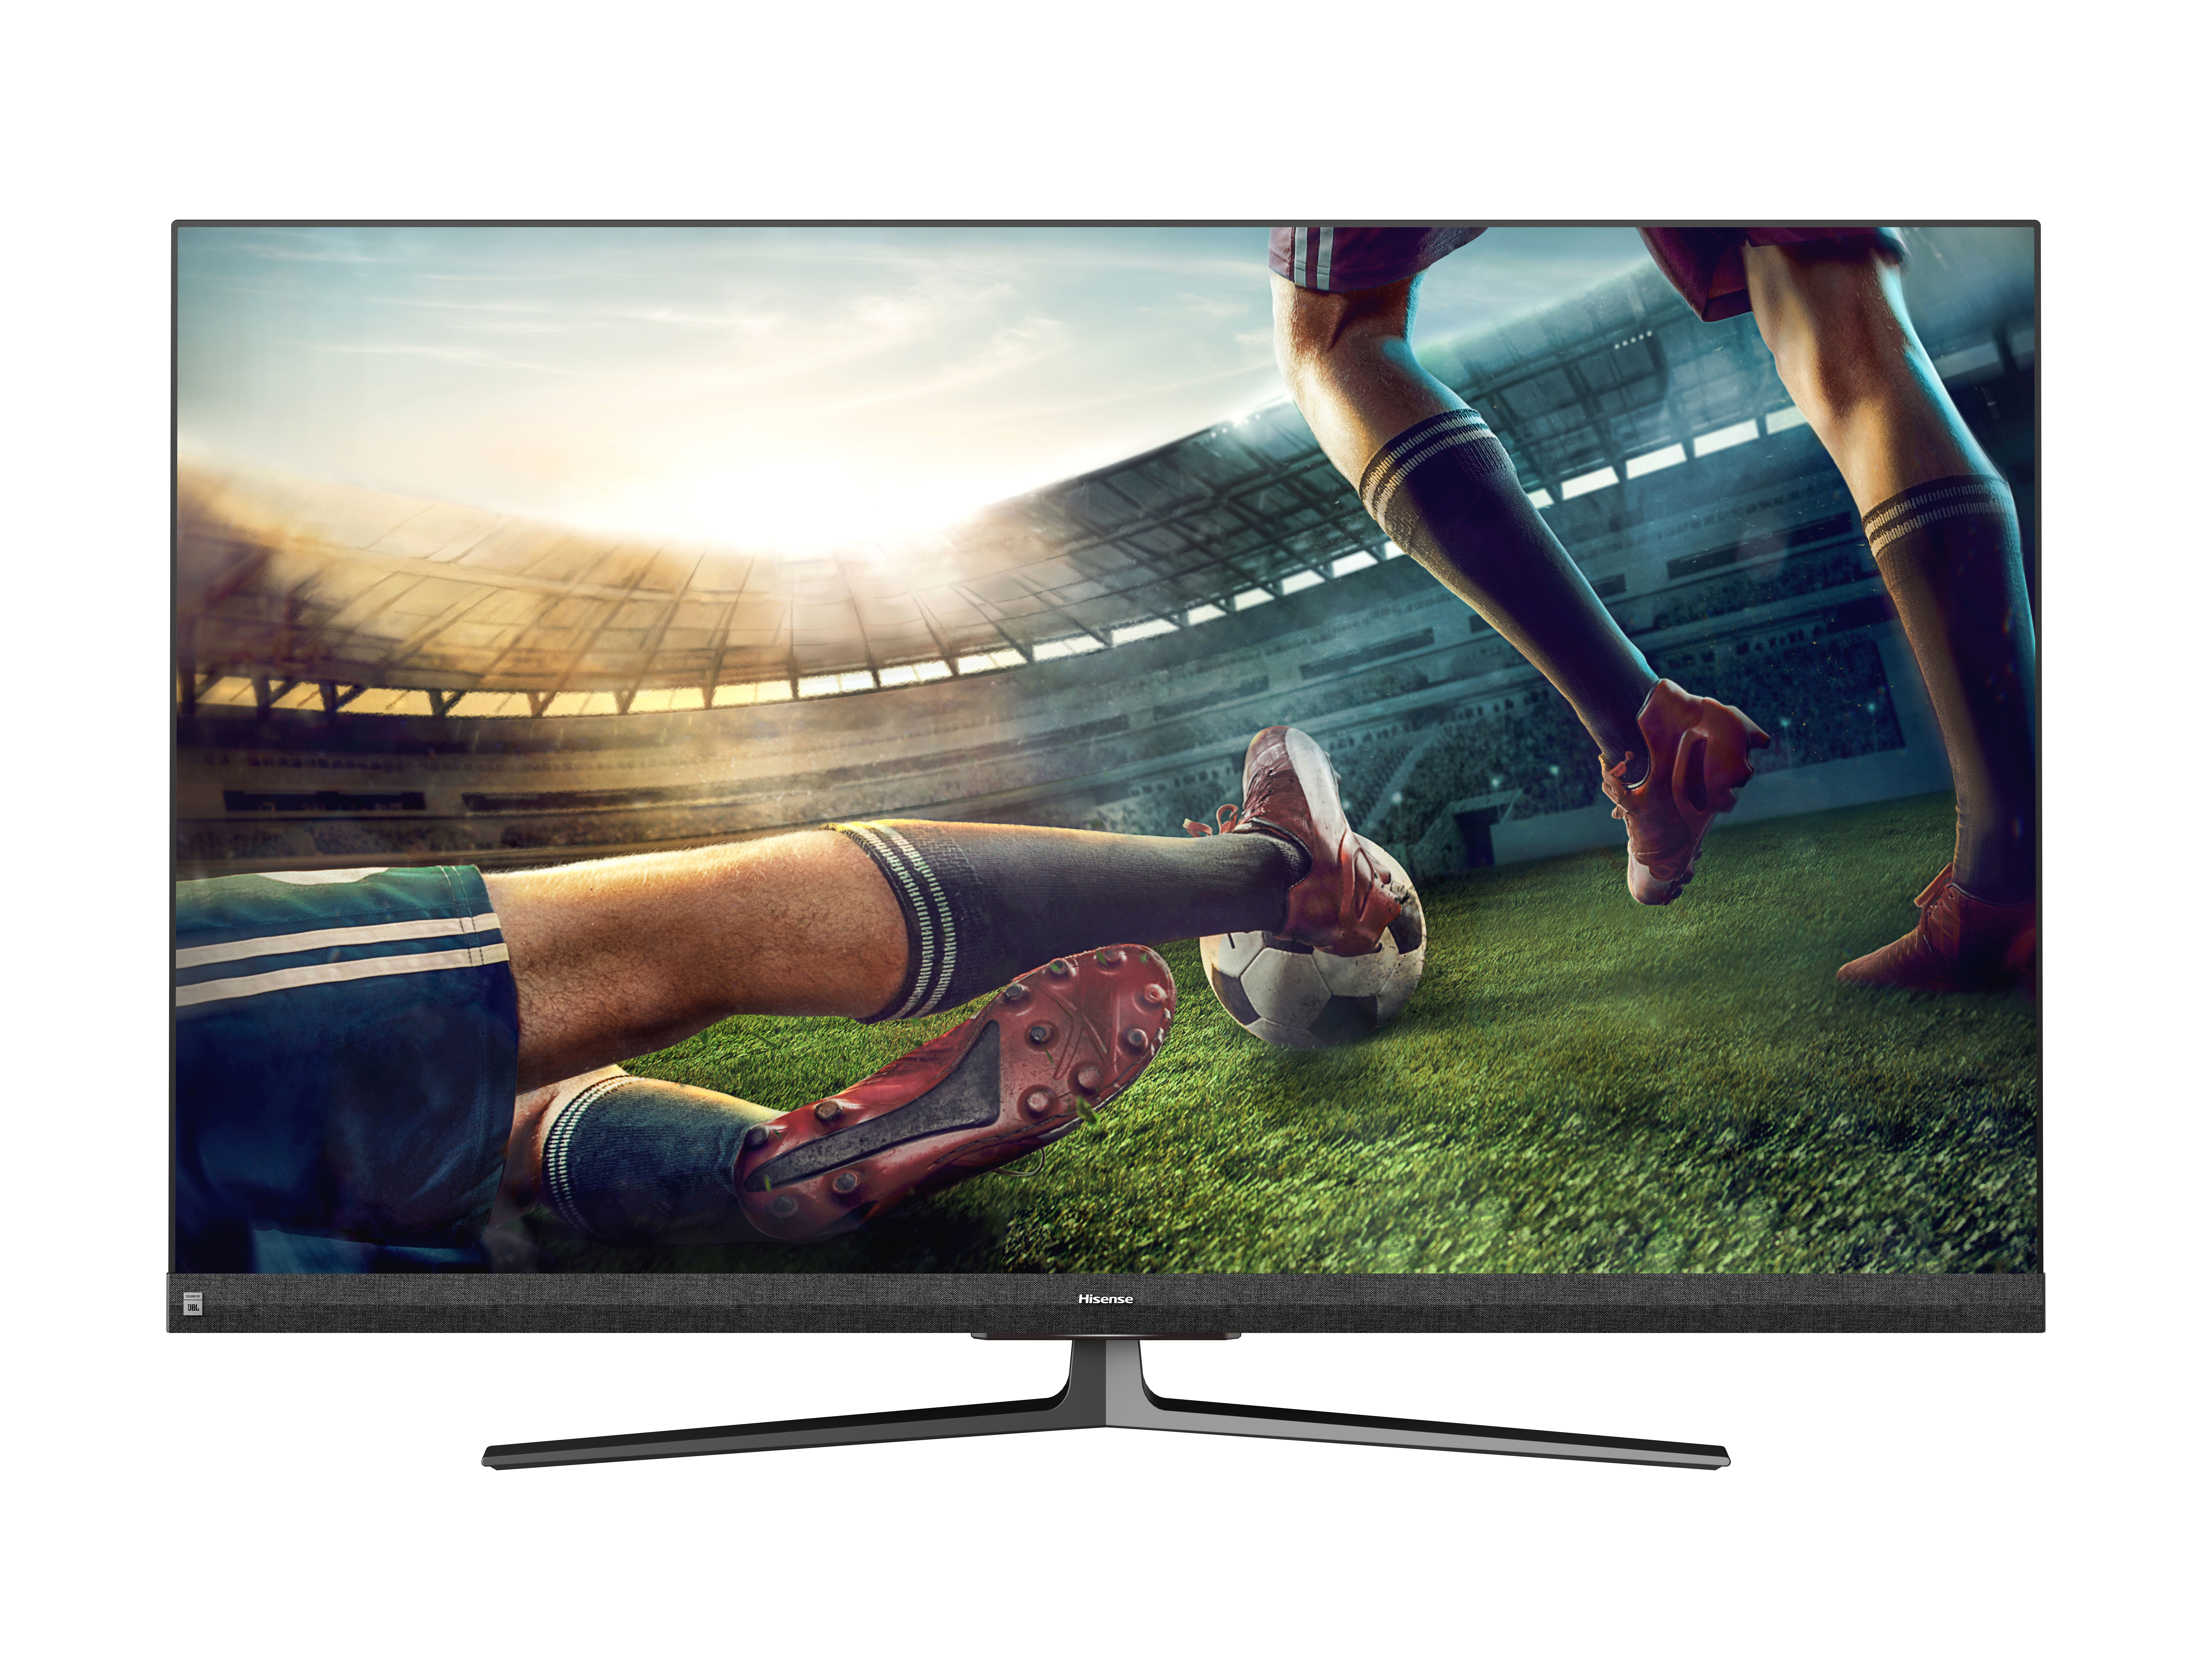 Hisense U8QF 55U8QF TV 138,7 cm (54.6